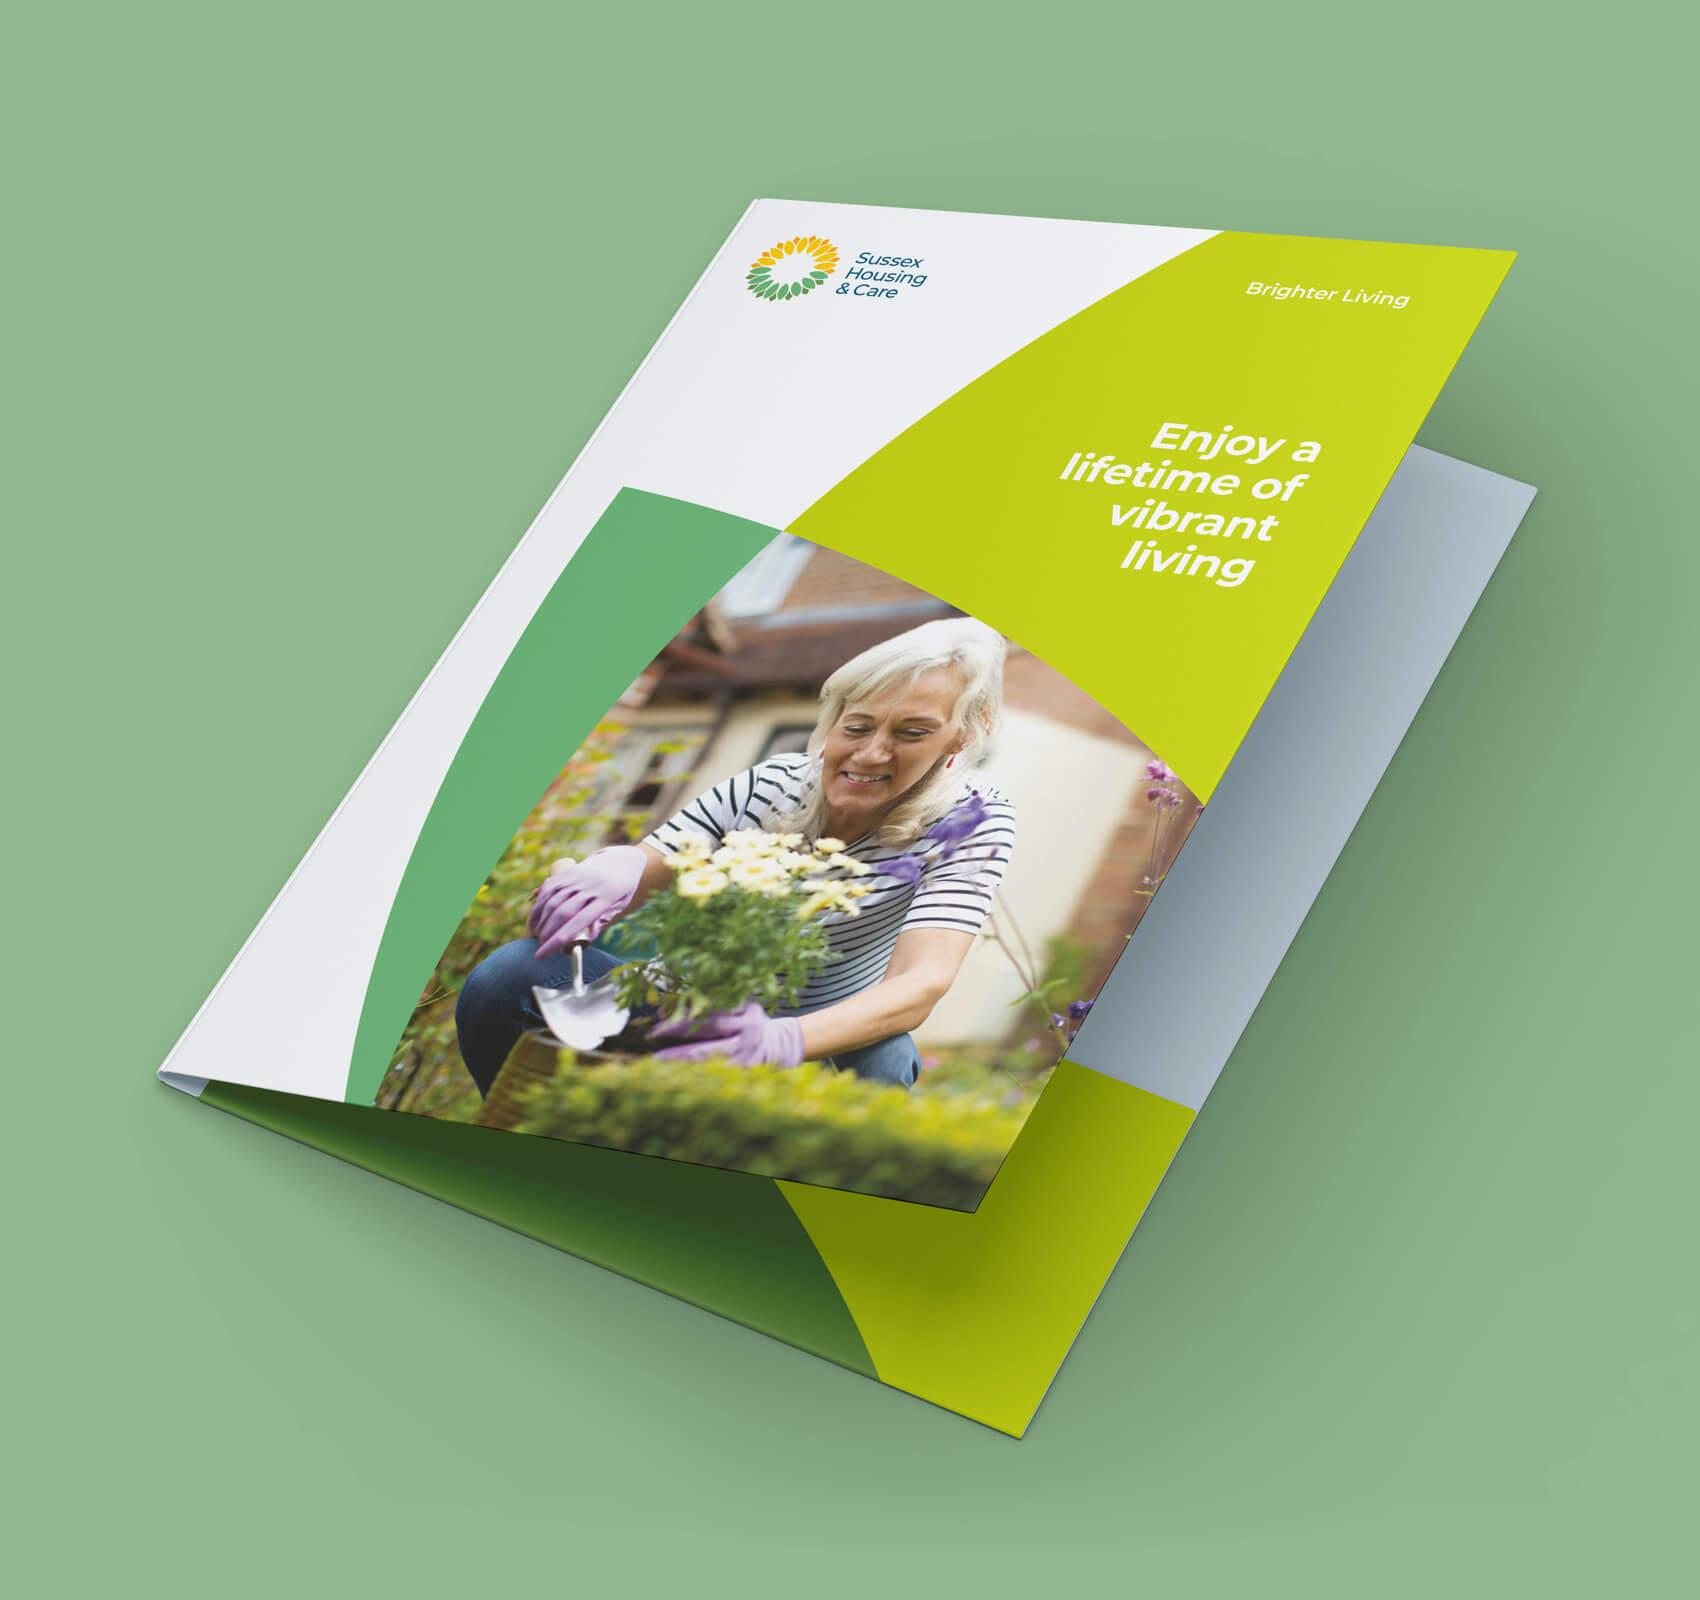 Sussex Housing & Care folder